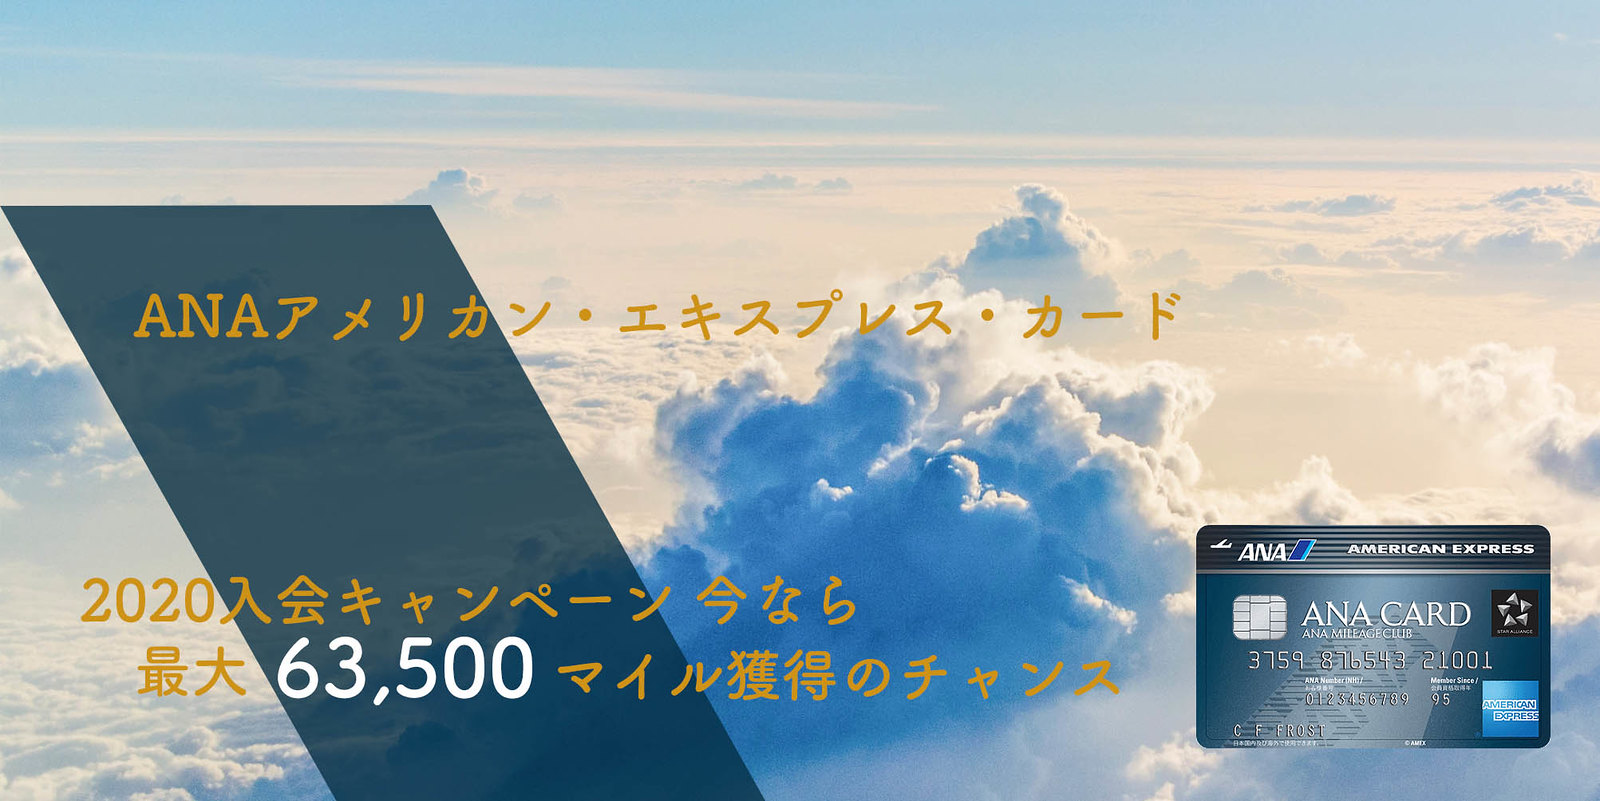 ANAアメックス入会キャンペーン 2020年 最大35000マイル